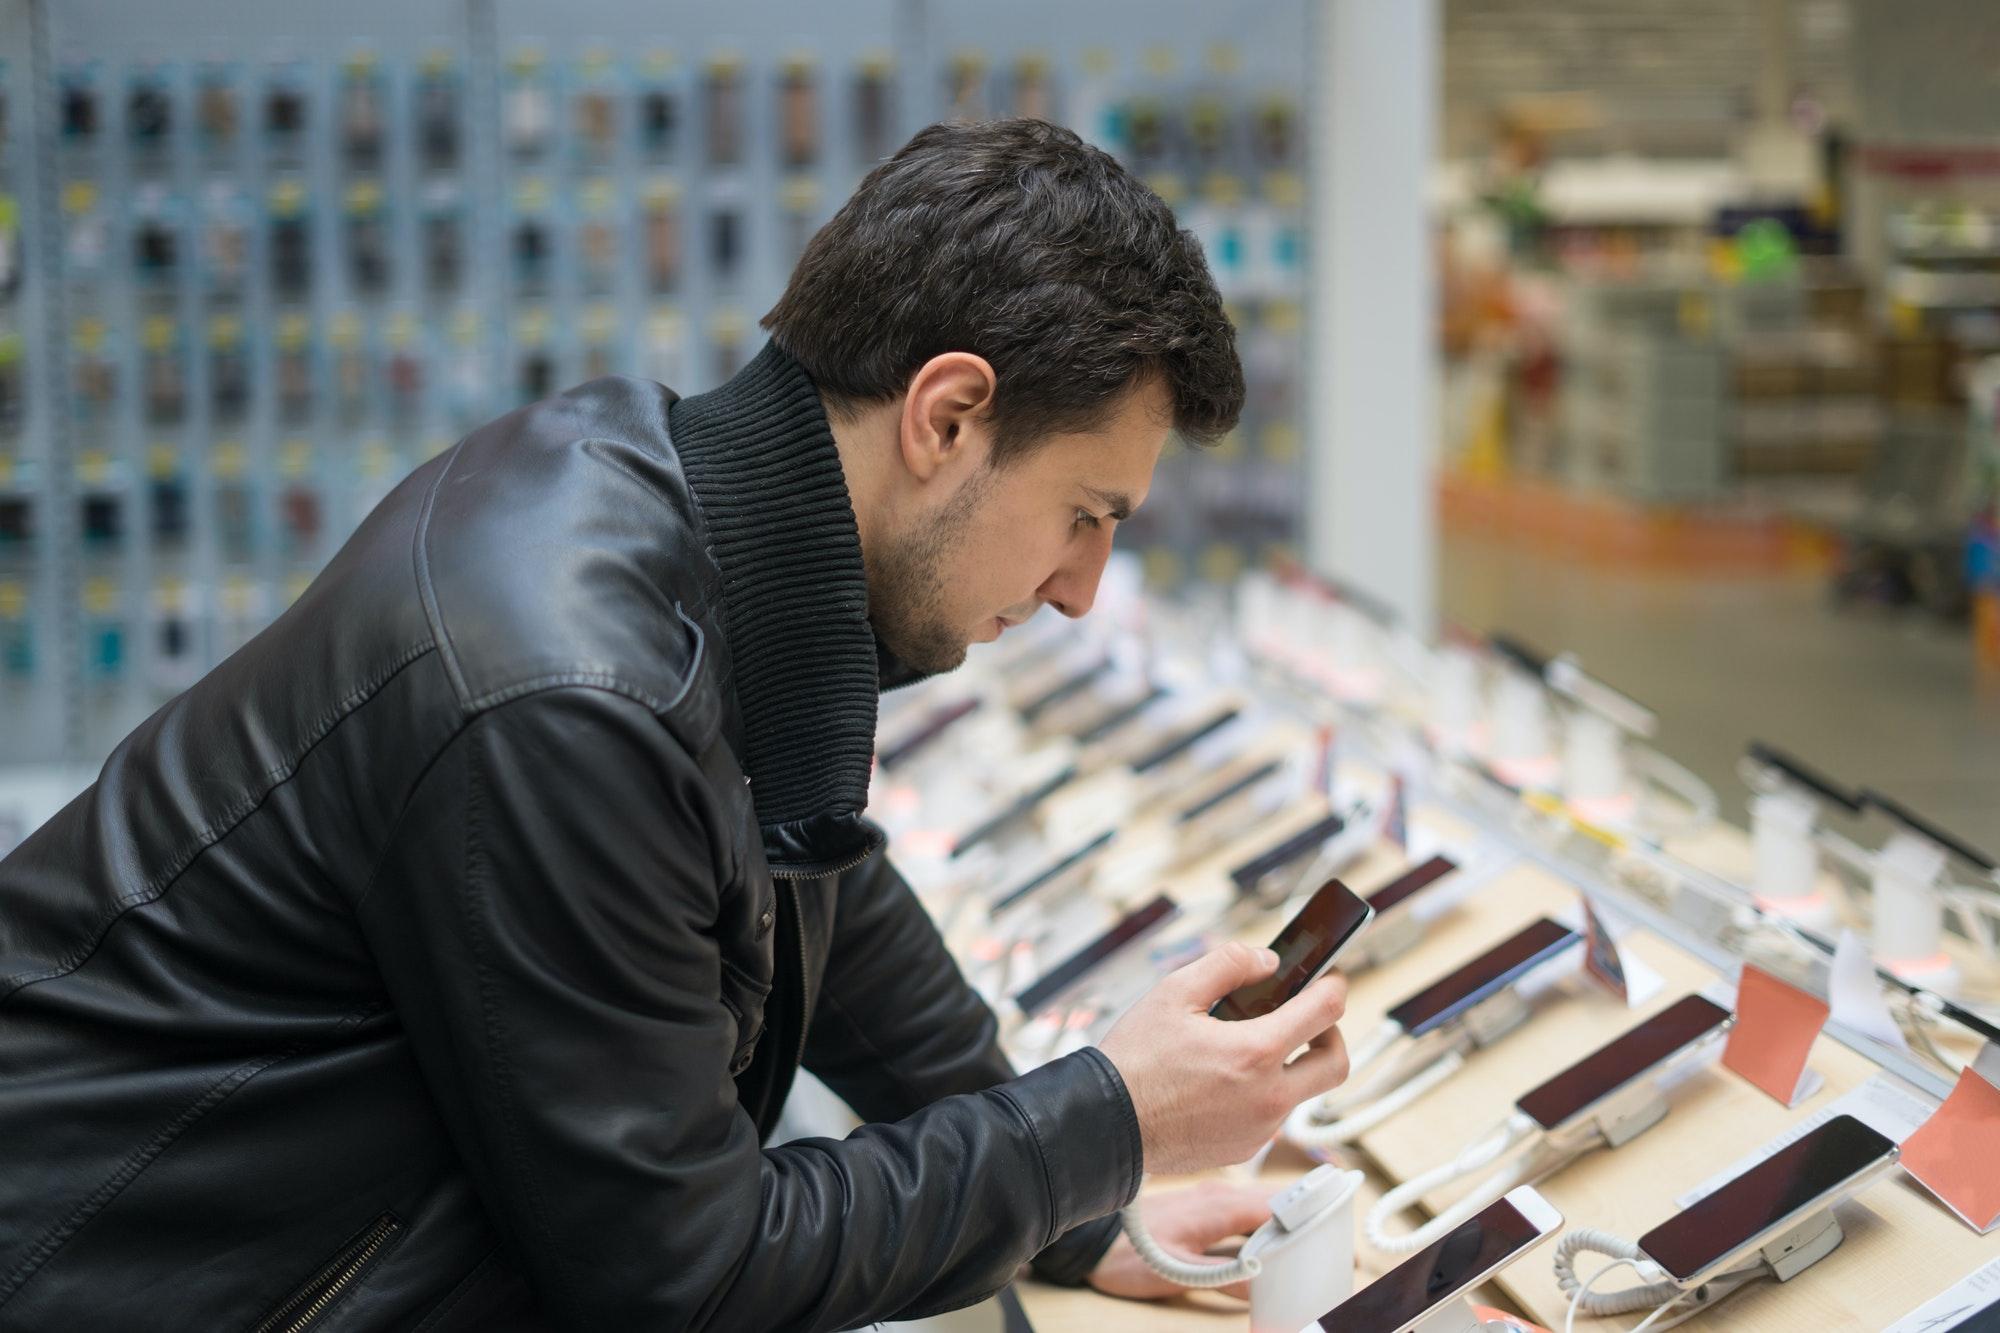 young male customer choosing smartphone